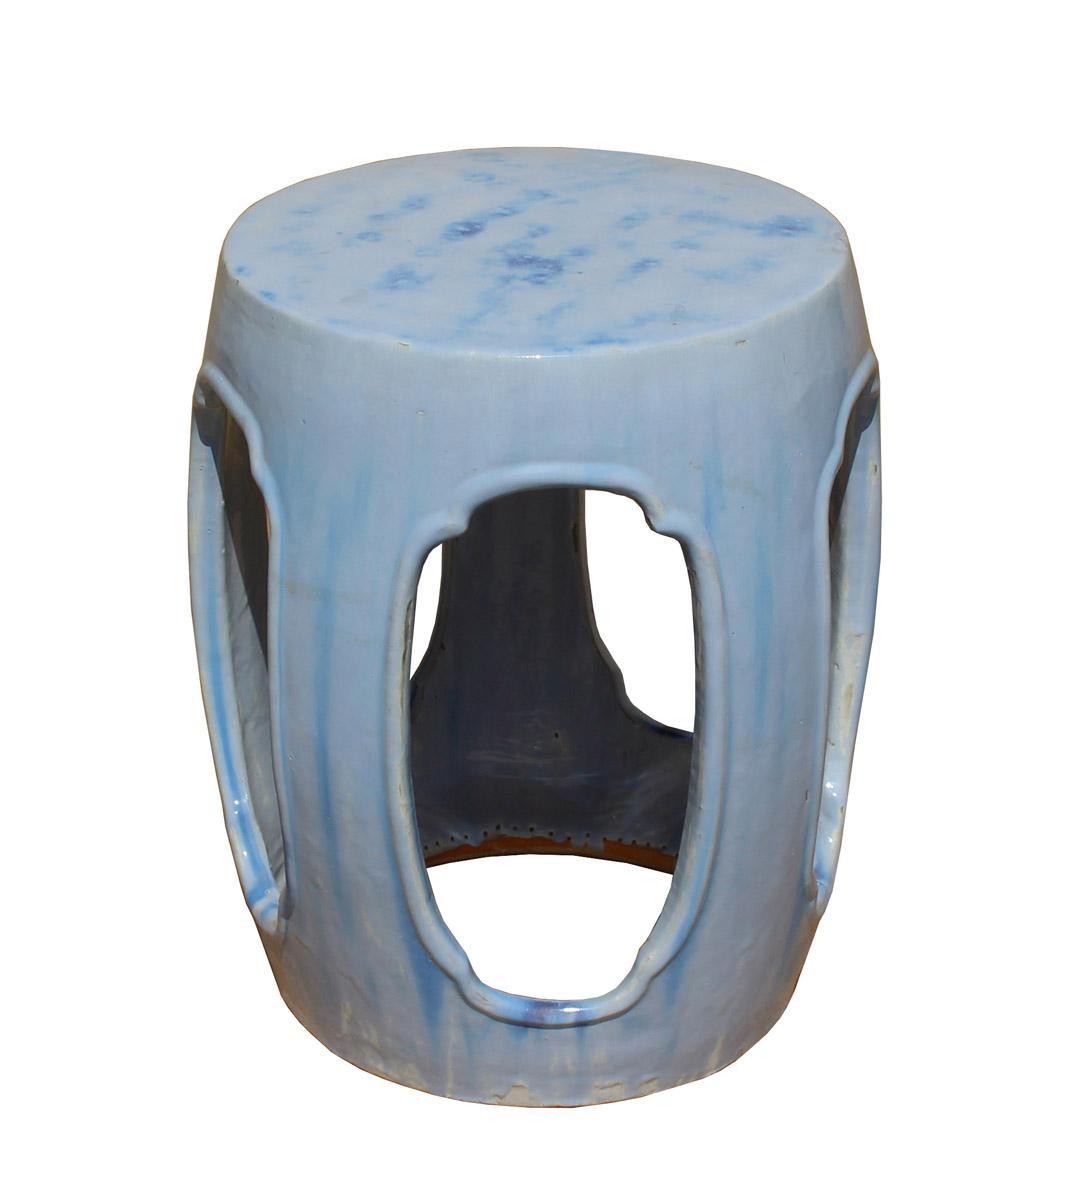 Chinese Round Barrel Light Blue Ceramic Clay Garden Stool